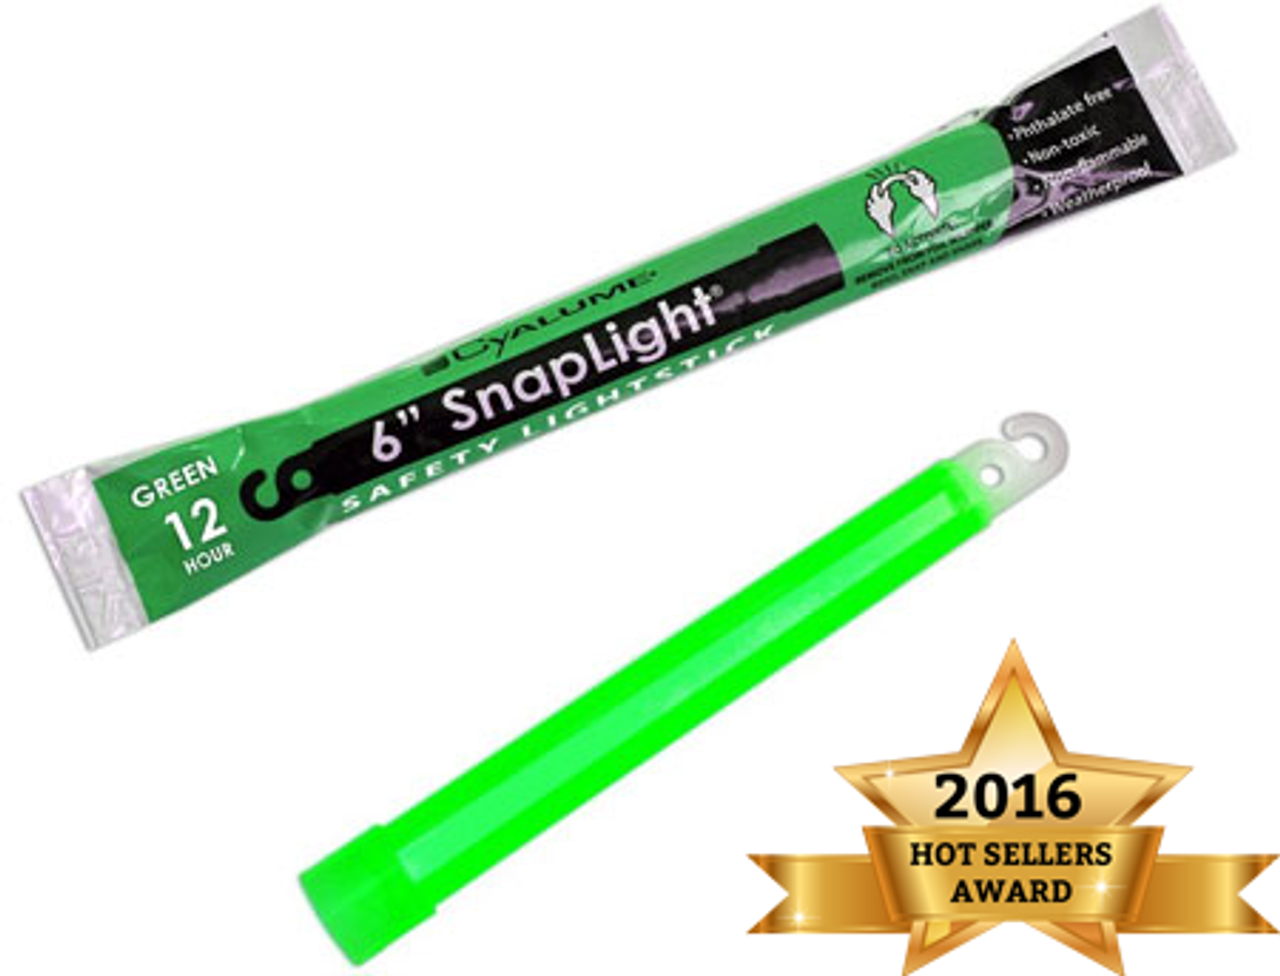 12 Hour Lightstick - Green